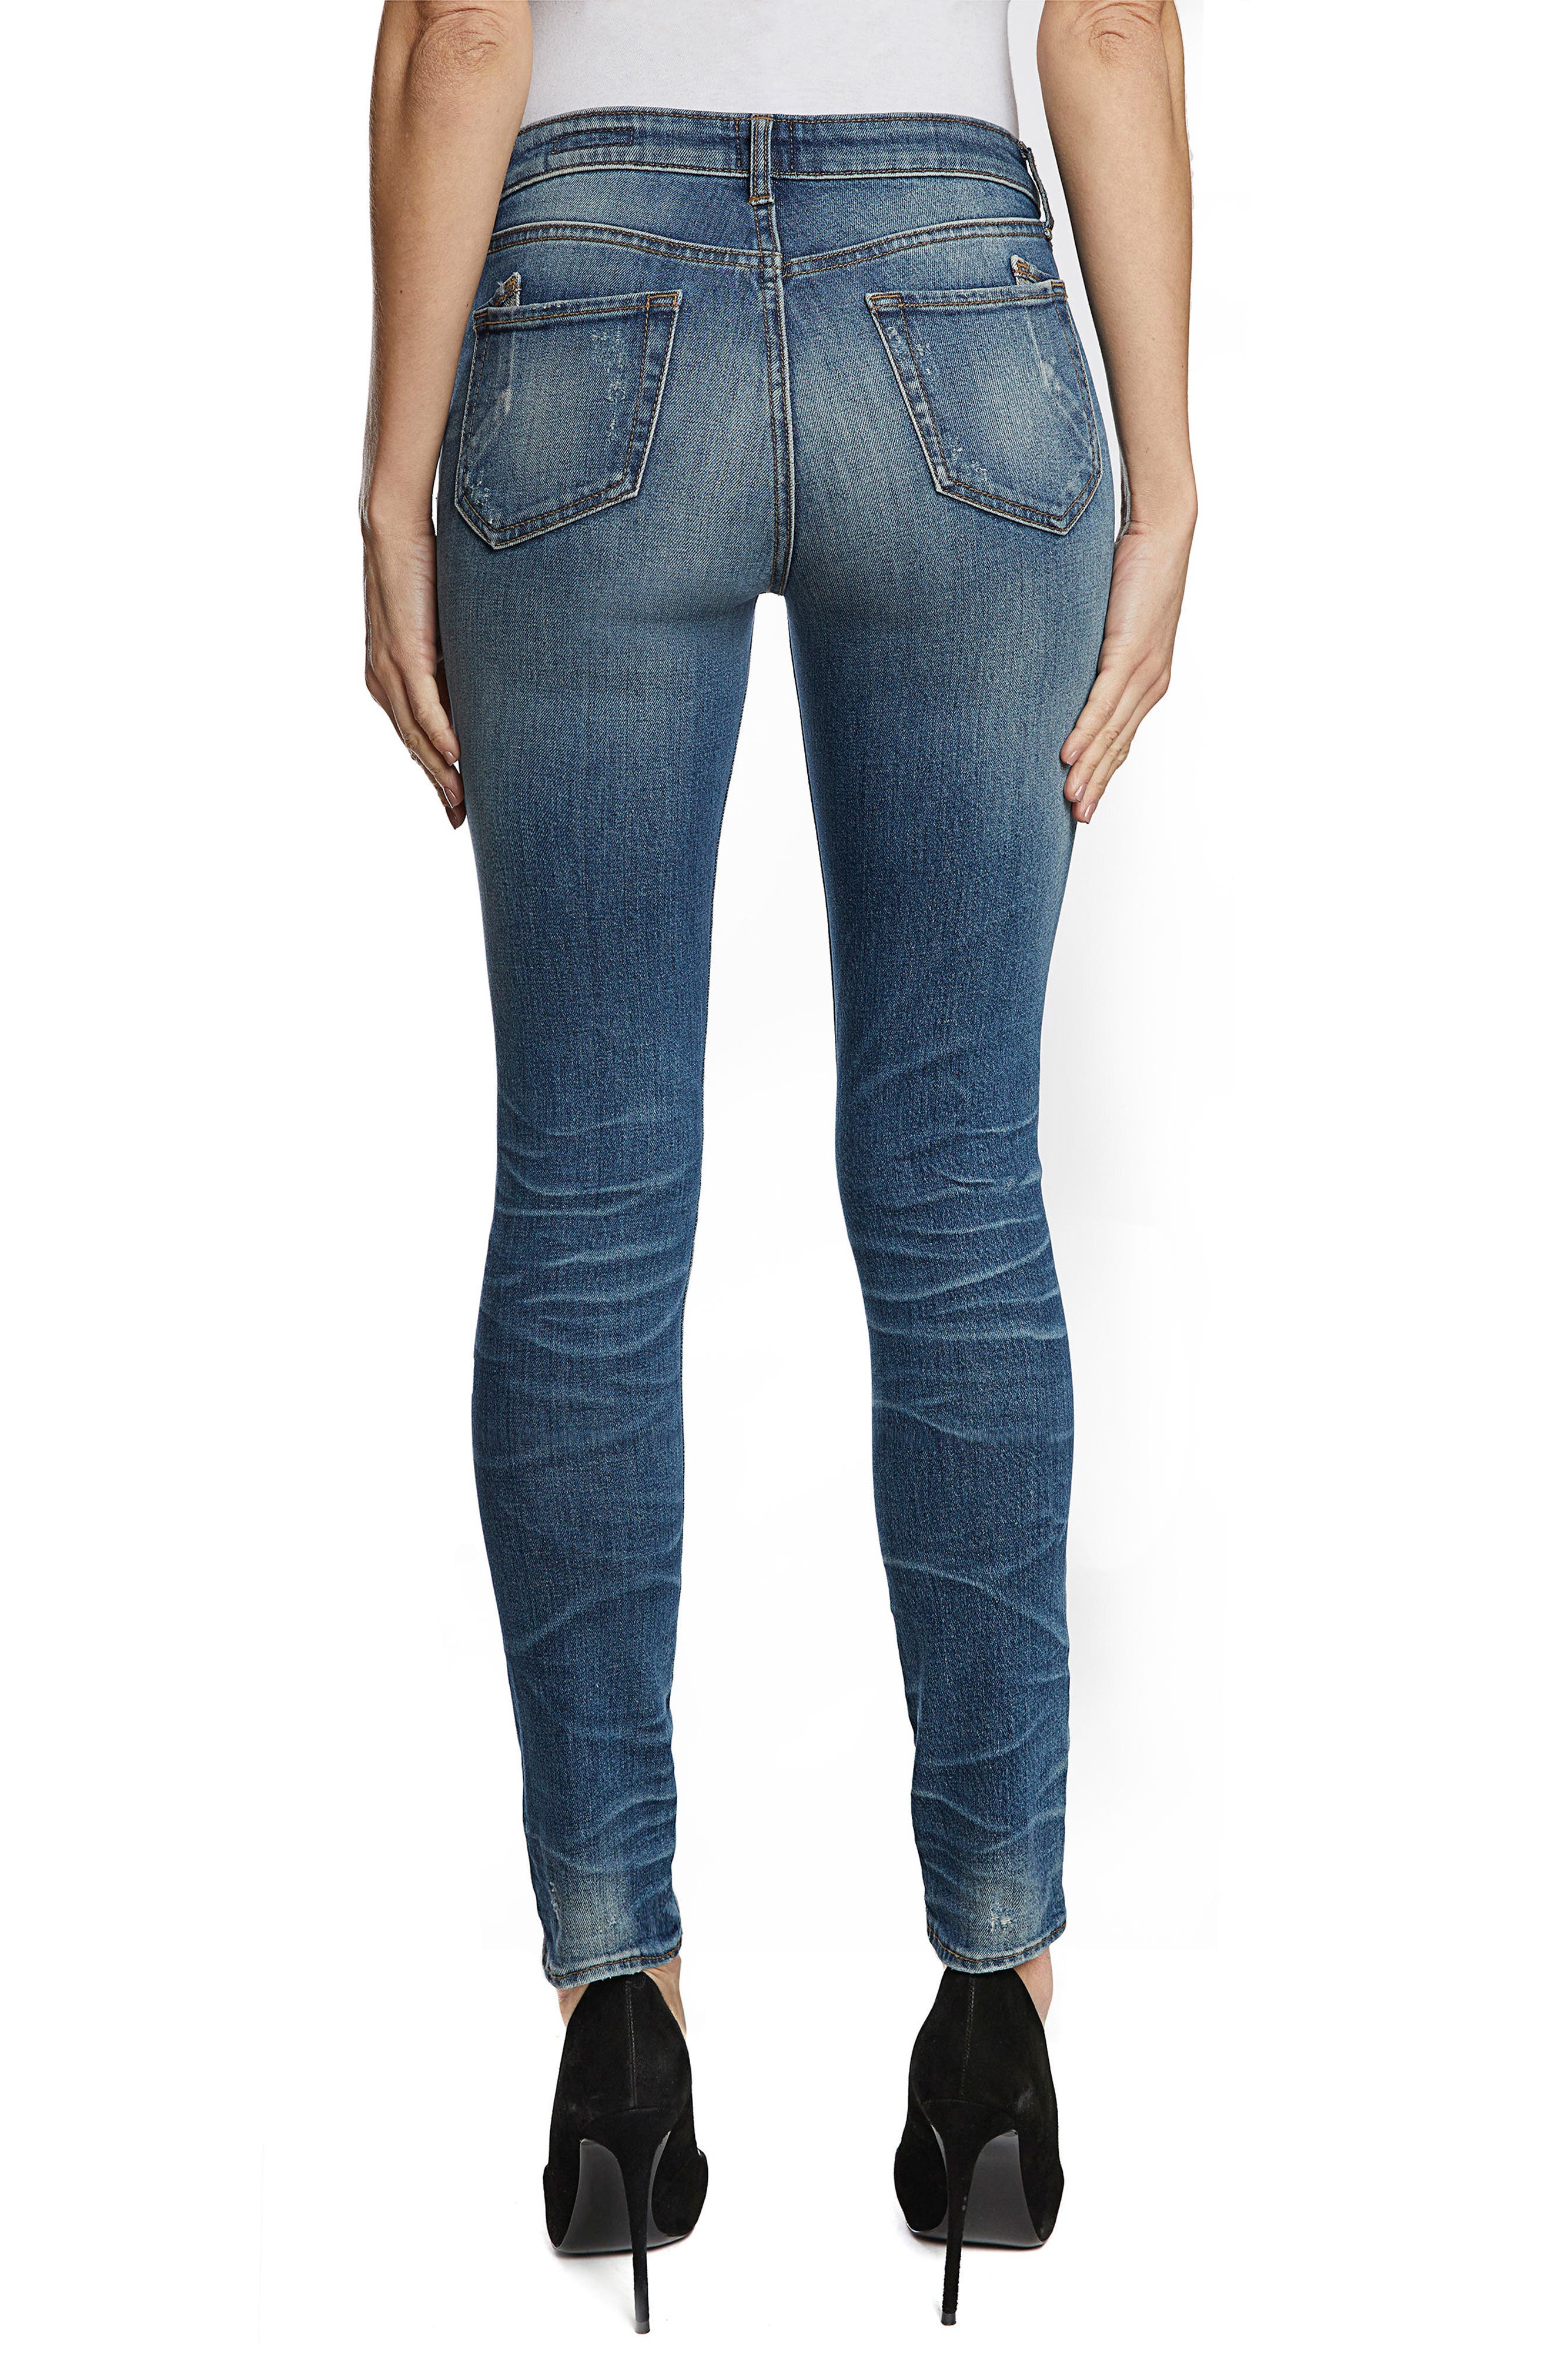 Camaro Ankle Skinny Jeans,                             Alternate thumbnail 2, color,                             490